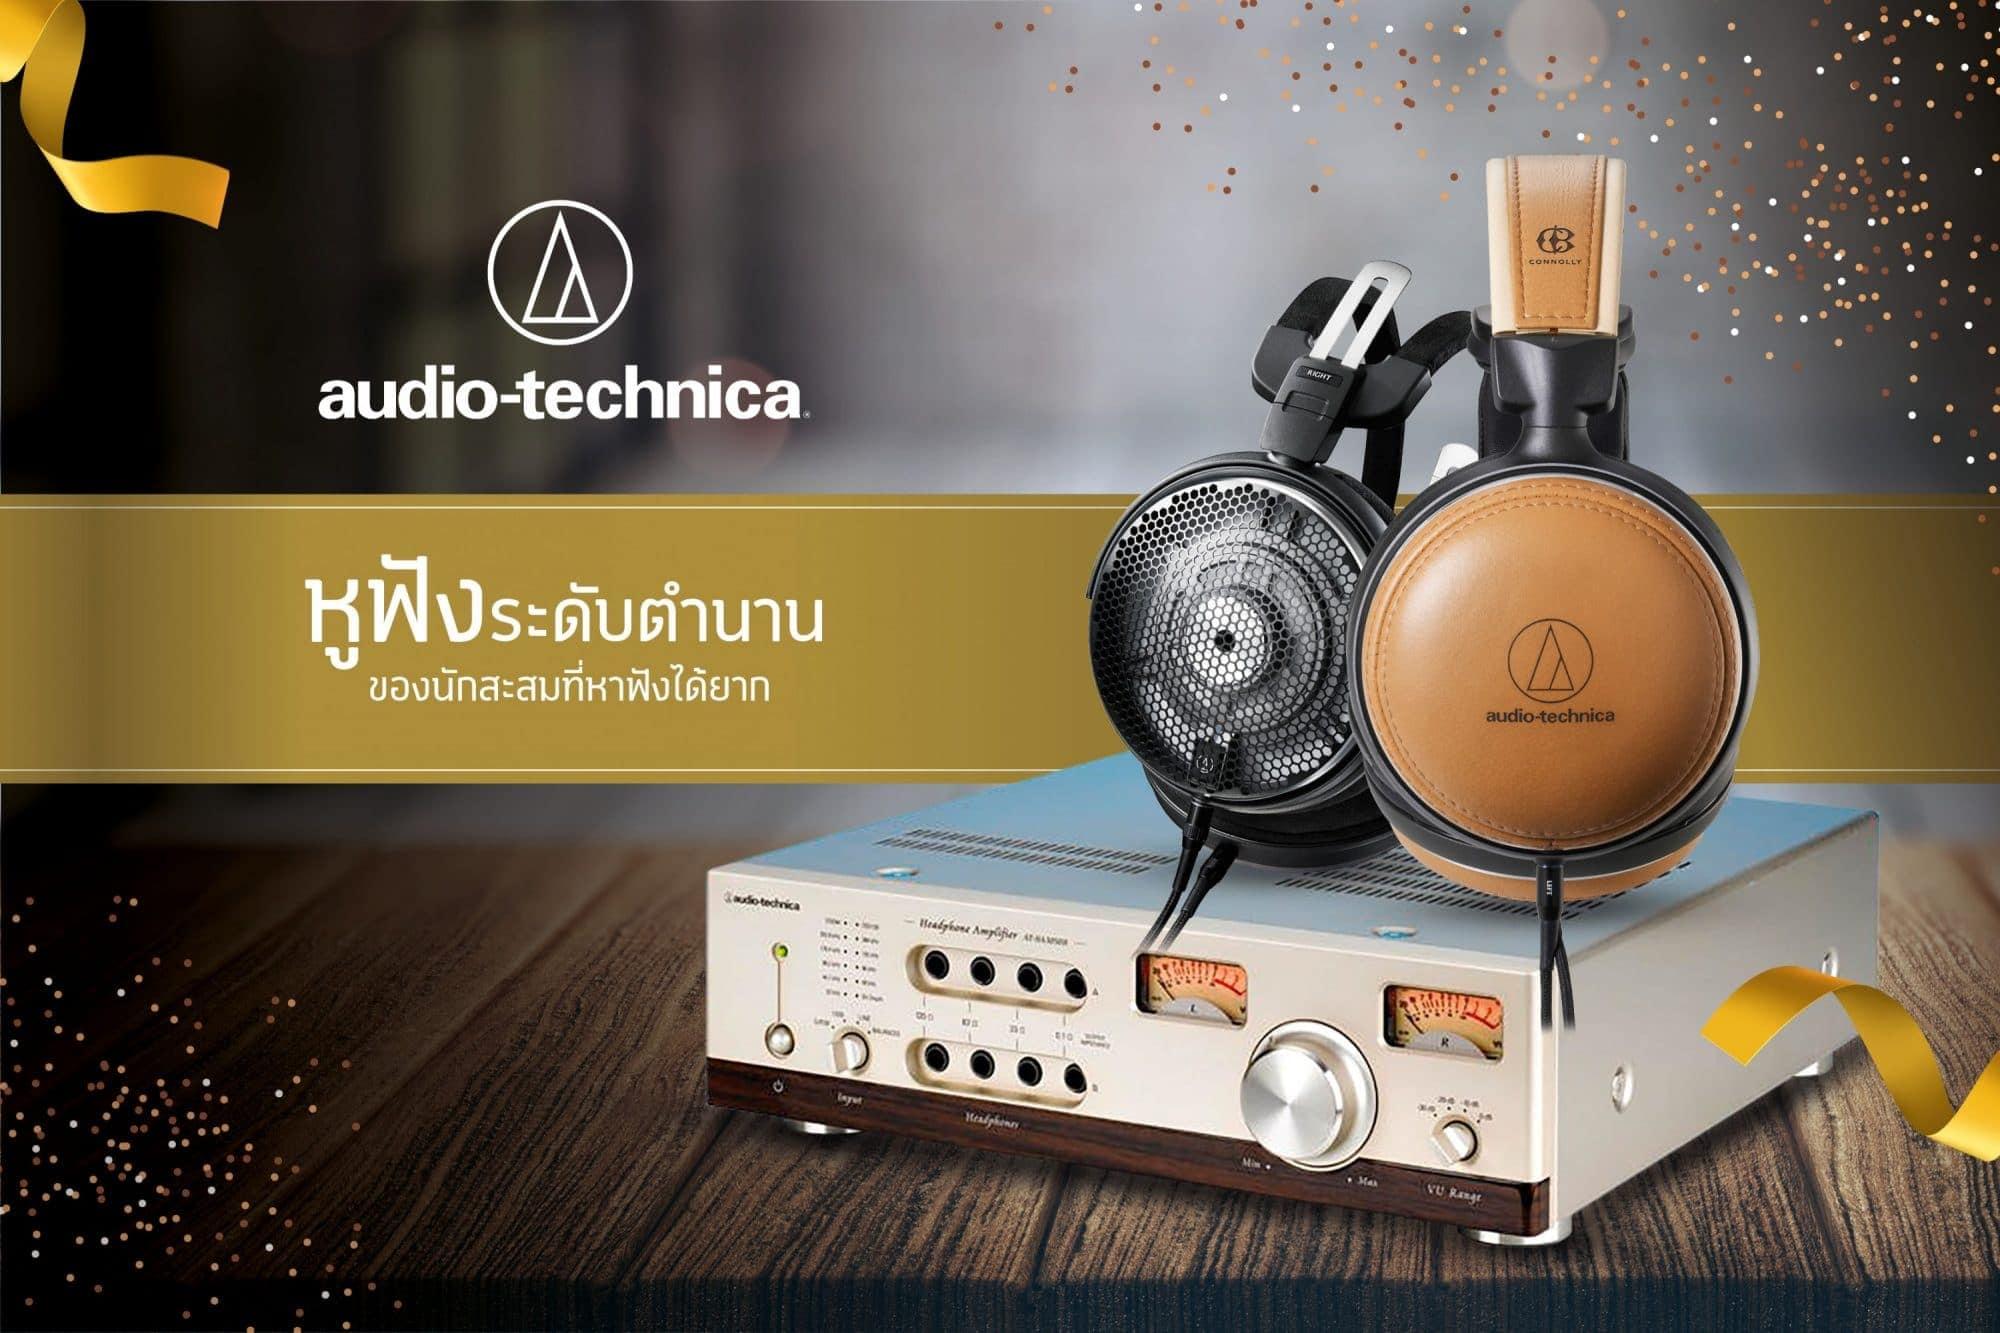 - RTB ยกขบวนหูฟังสุดฮิตราคาพิเศษจากแบรนด์ชื่อดัง มาจำหน่ายในงาน TME2019